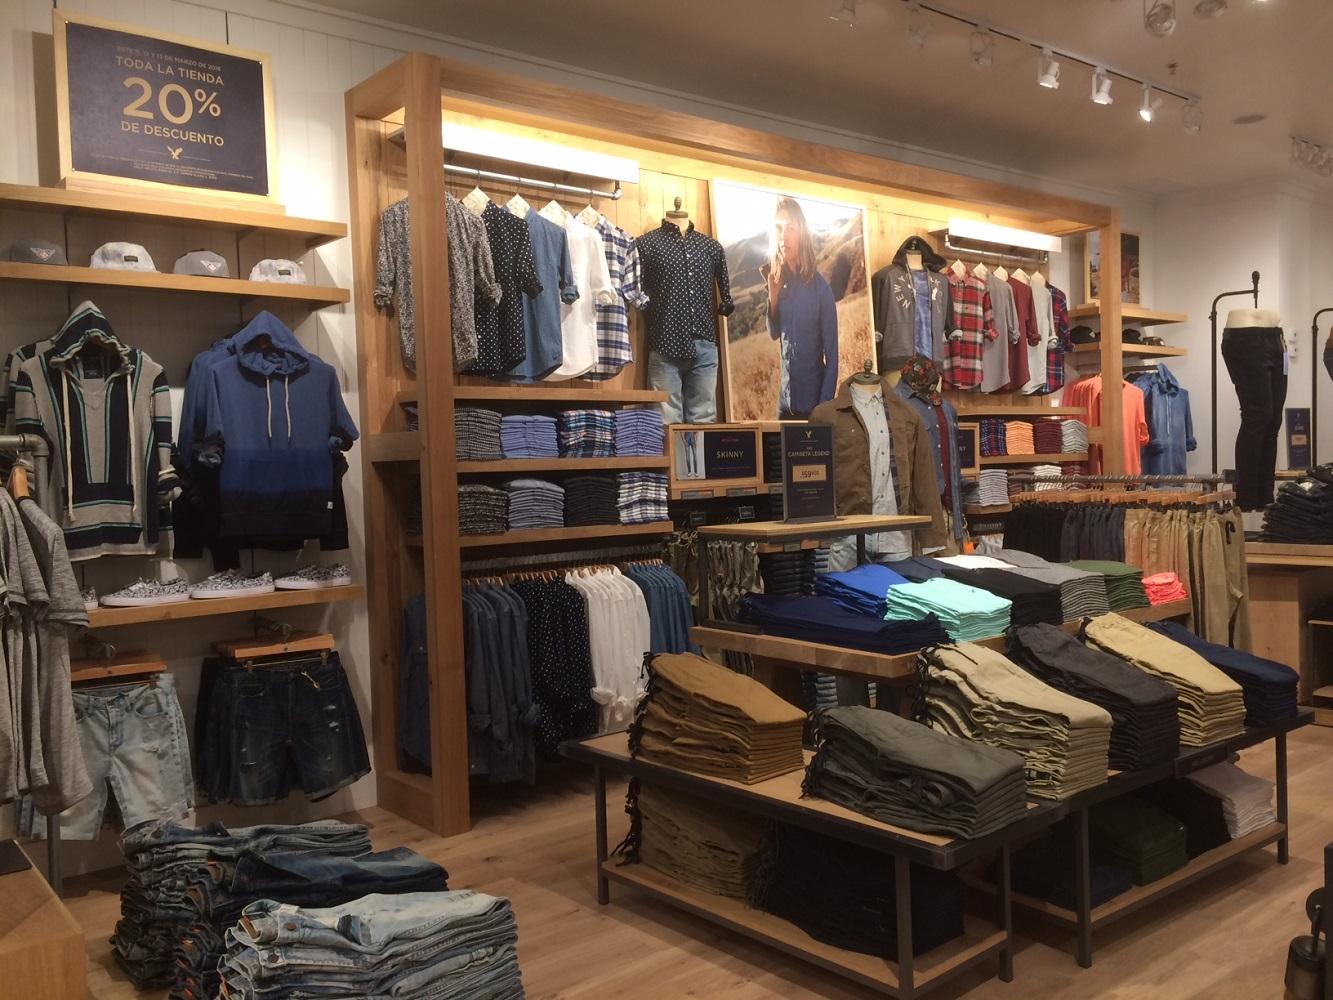 Interior - Clothes Shelves 2.jpg